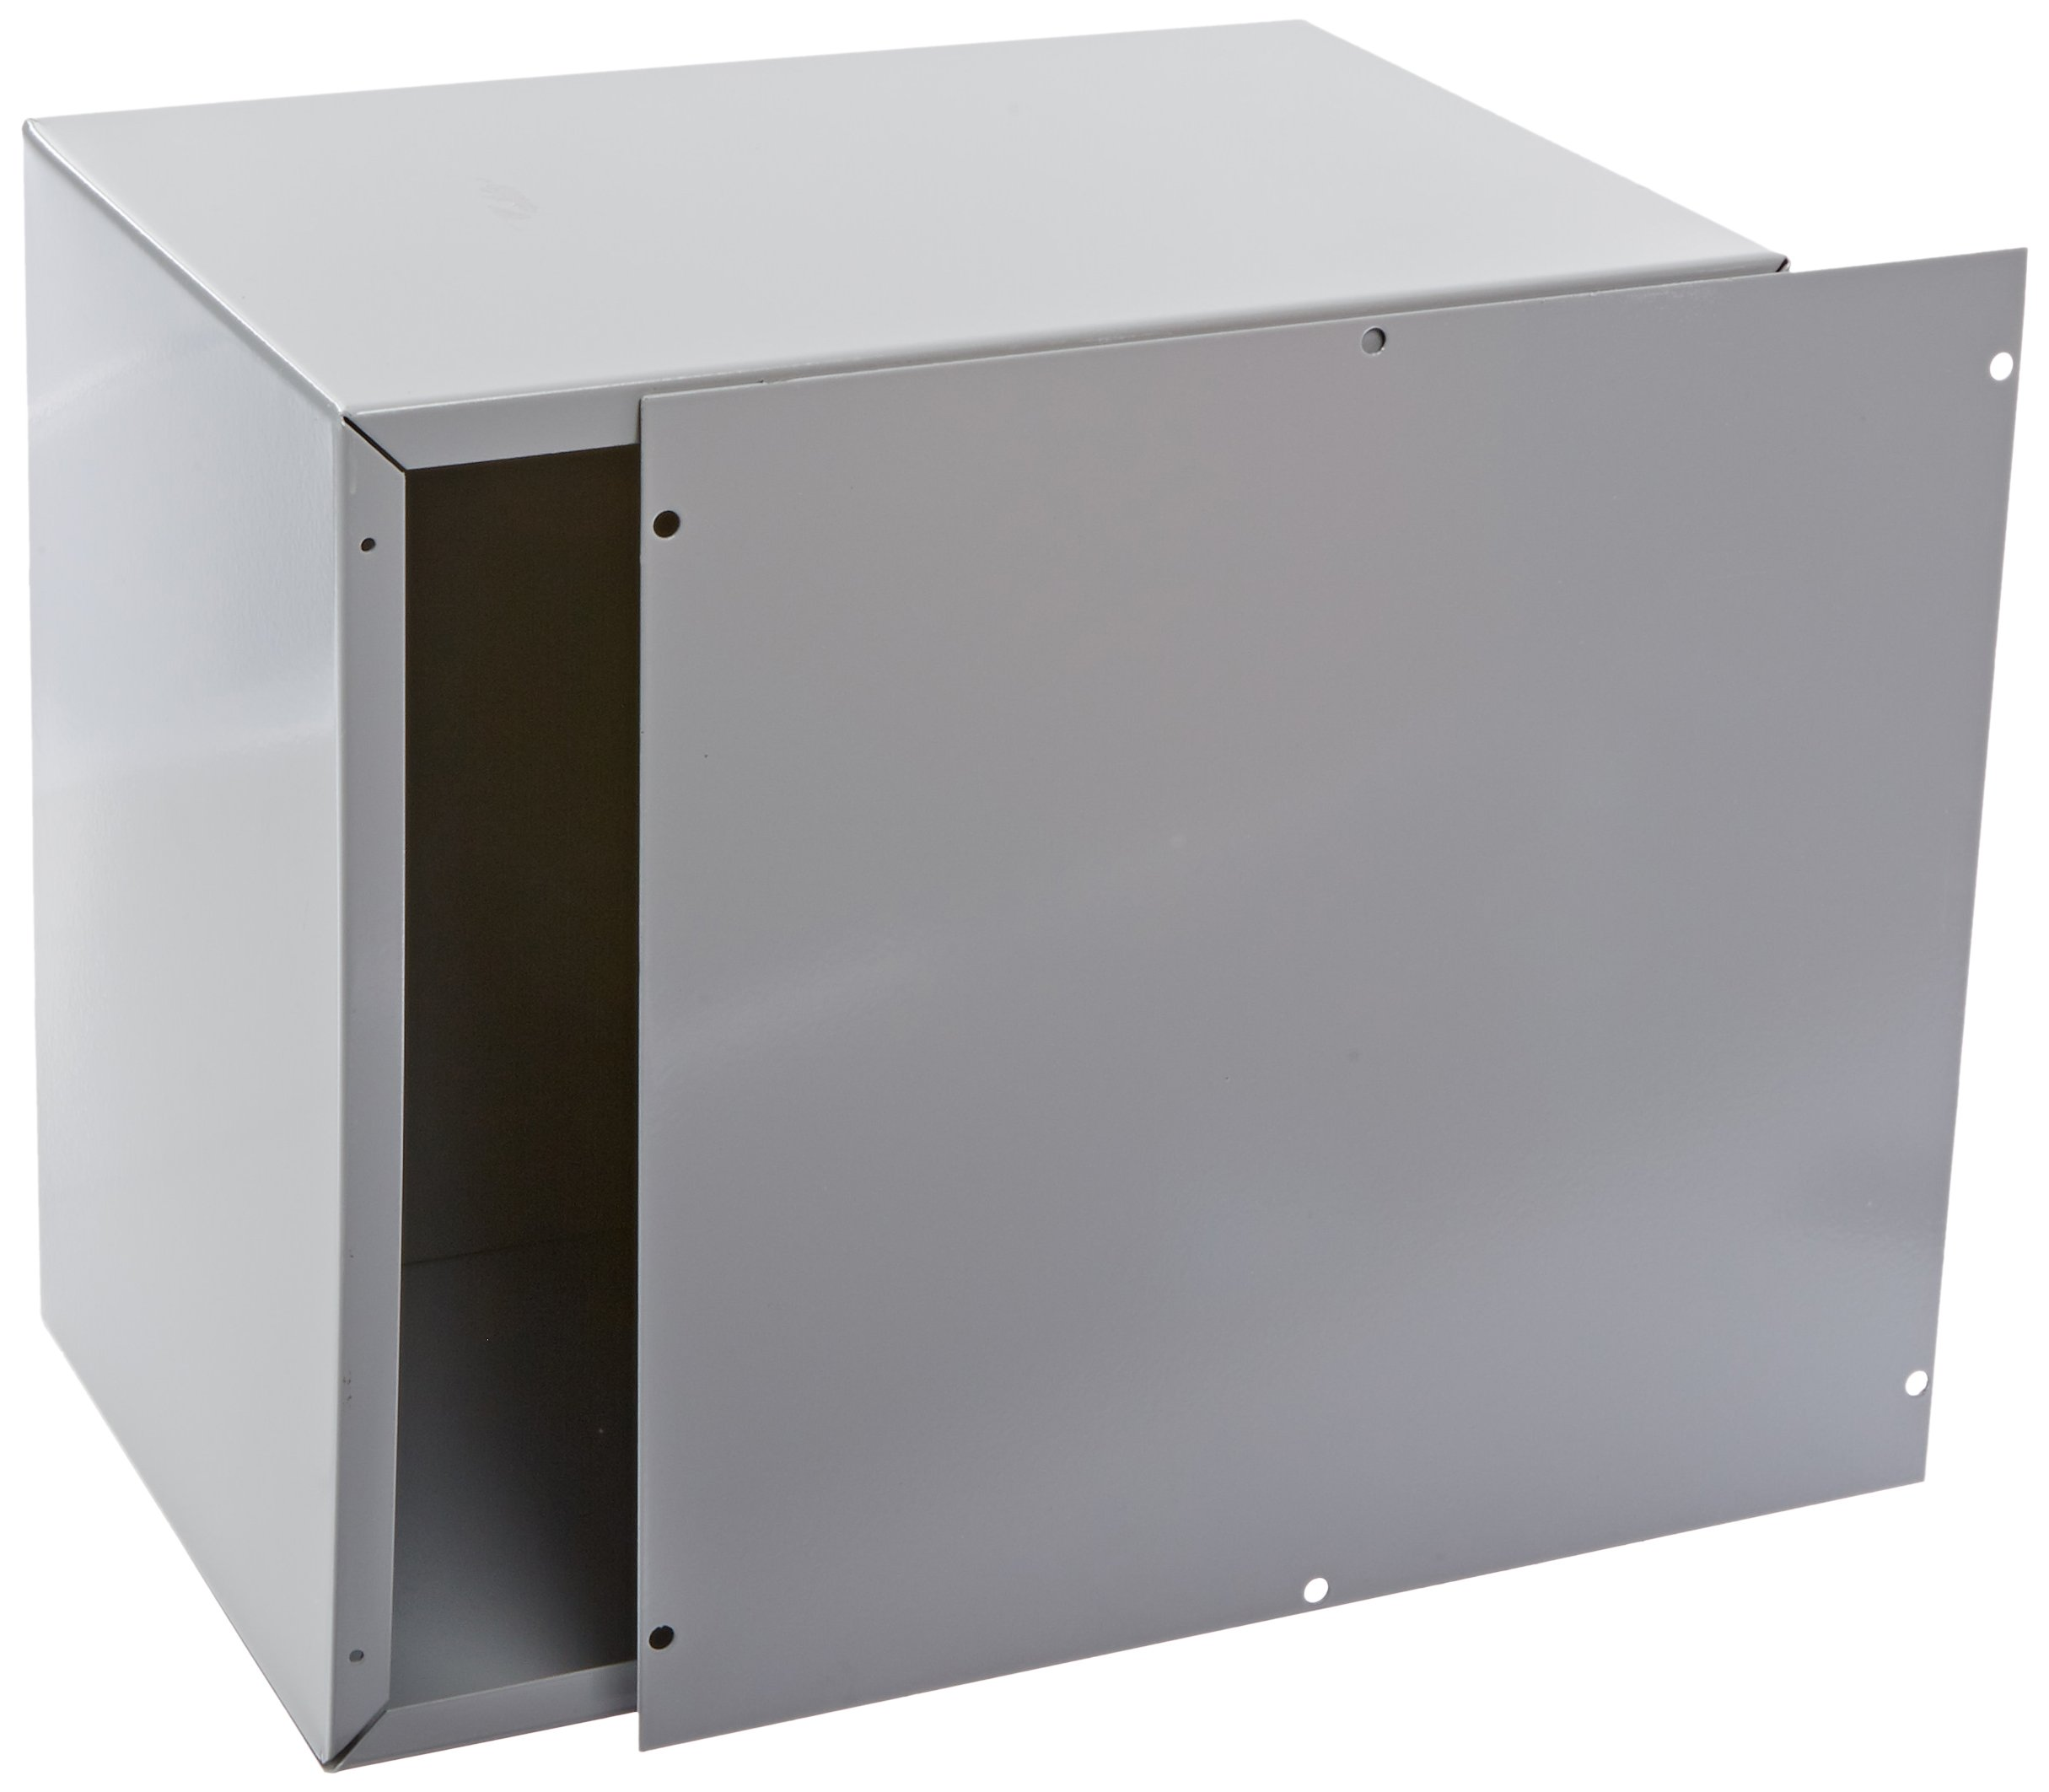 BUD Industries CU-881 Steel Utility Cabinet, 11'' Width x 12'' Height x 8'' Depth, Natural Finish